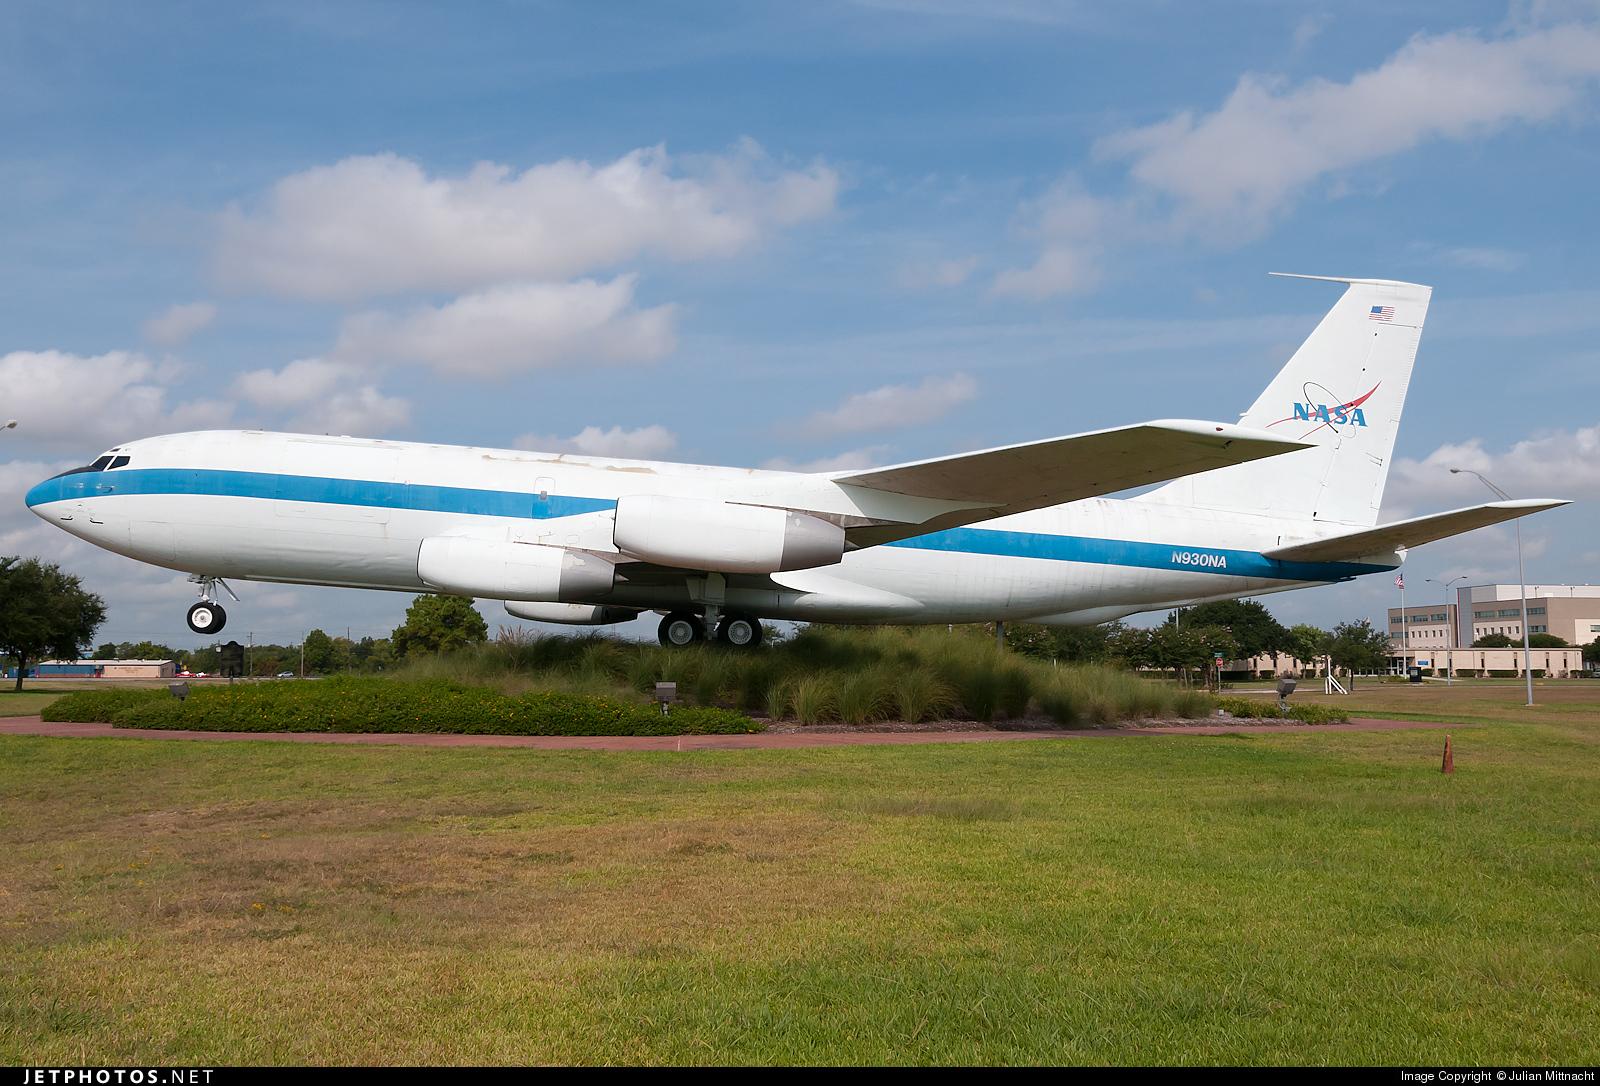 N930NA - Boeing KC-135A Stratotanker - United States - National Aeronautics and Space Administration (NASA)